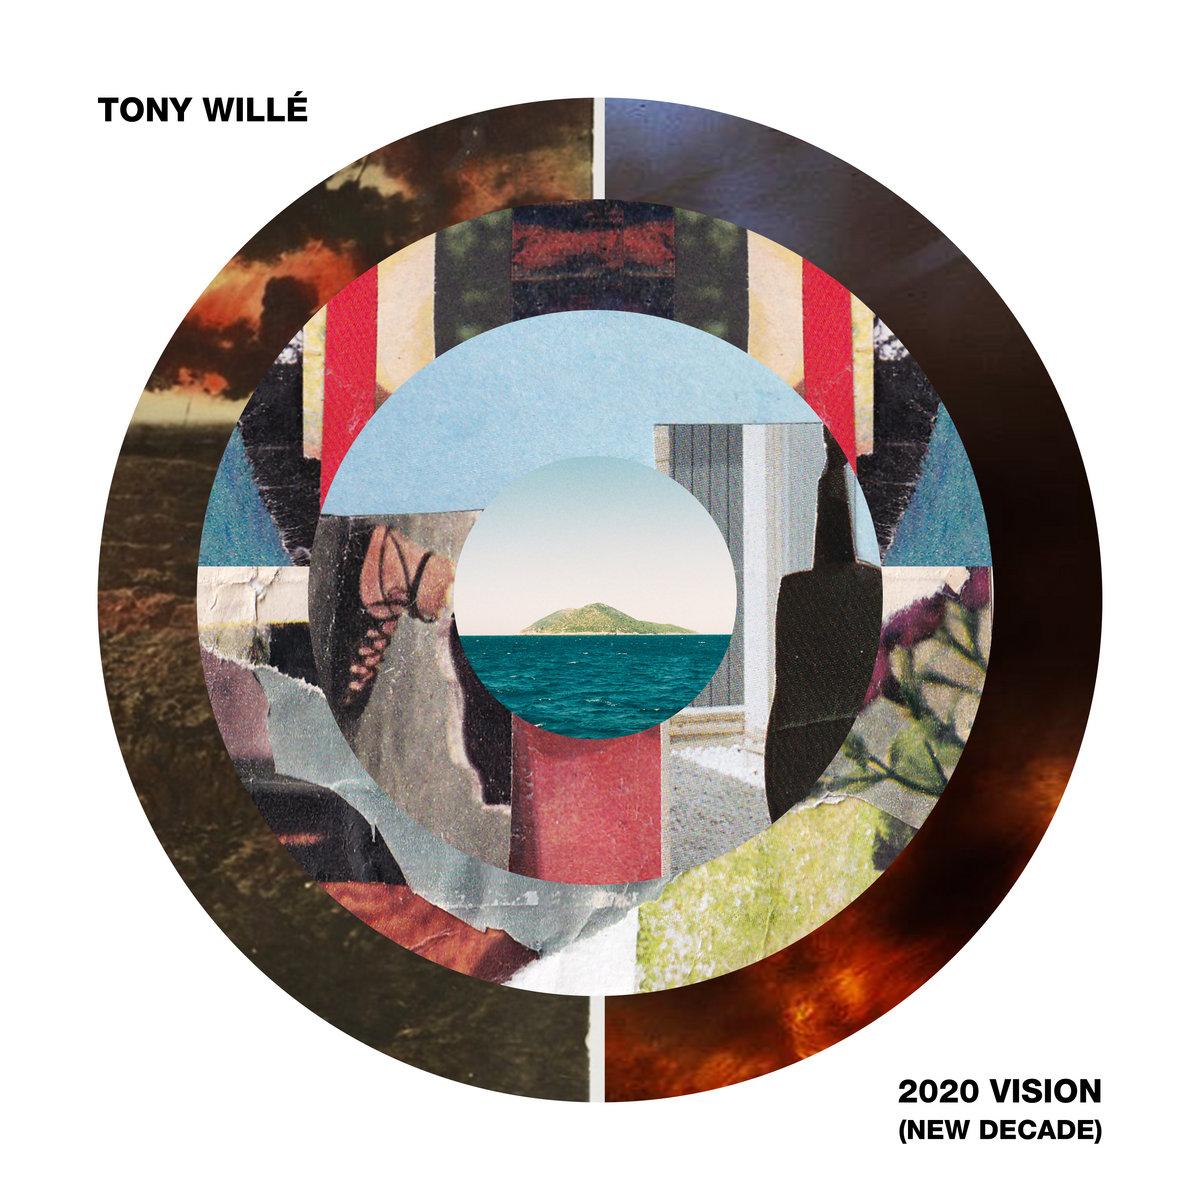 2020 Vision (New Decade) by Tony Willé